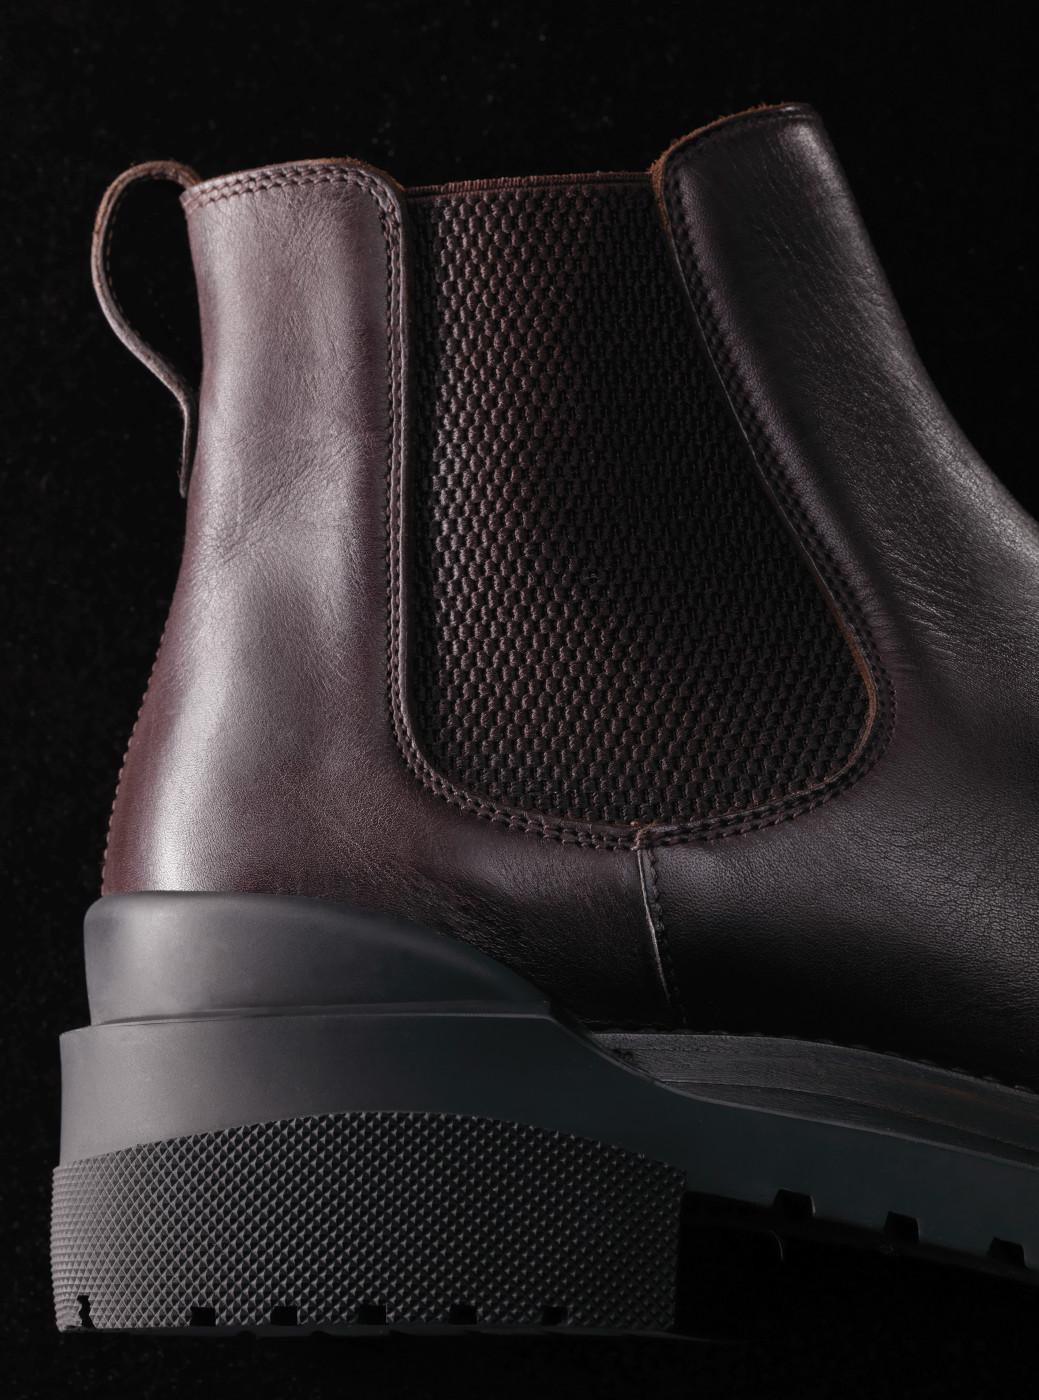 ERMENEGILDO ZEGNA COUTURE - Clip Chelsea Boots